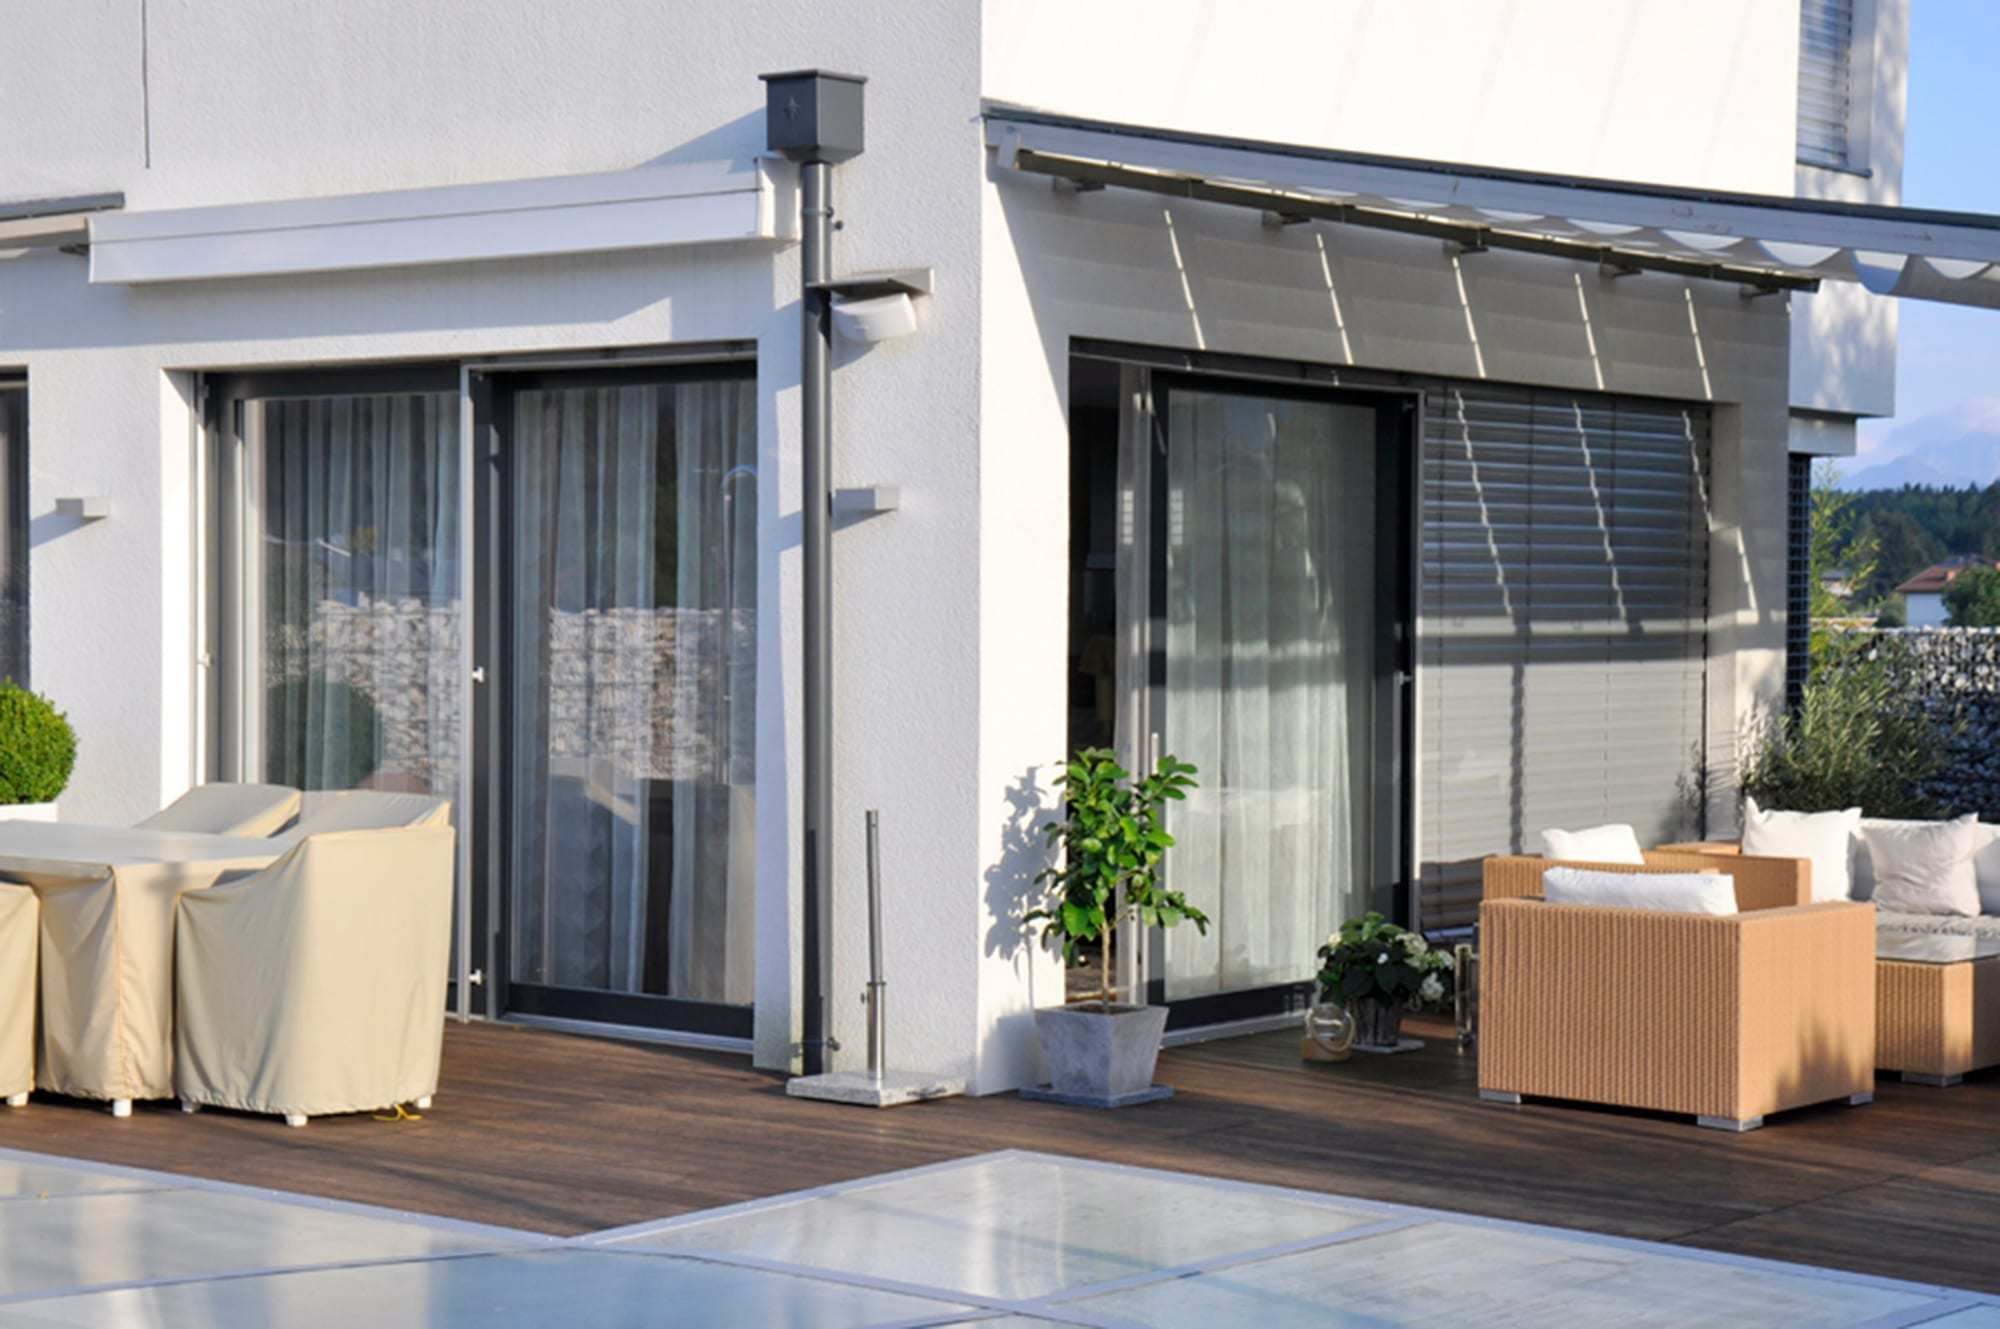 Fenster fachhandel k mmerling 88mm md mit alu vorsatzschale for Fenster 0 95